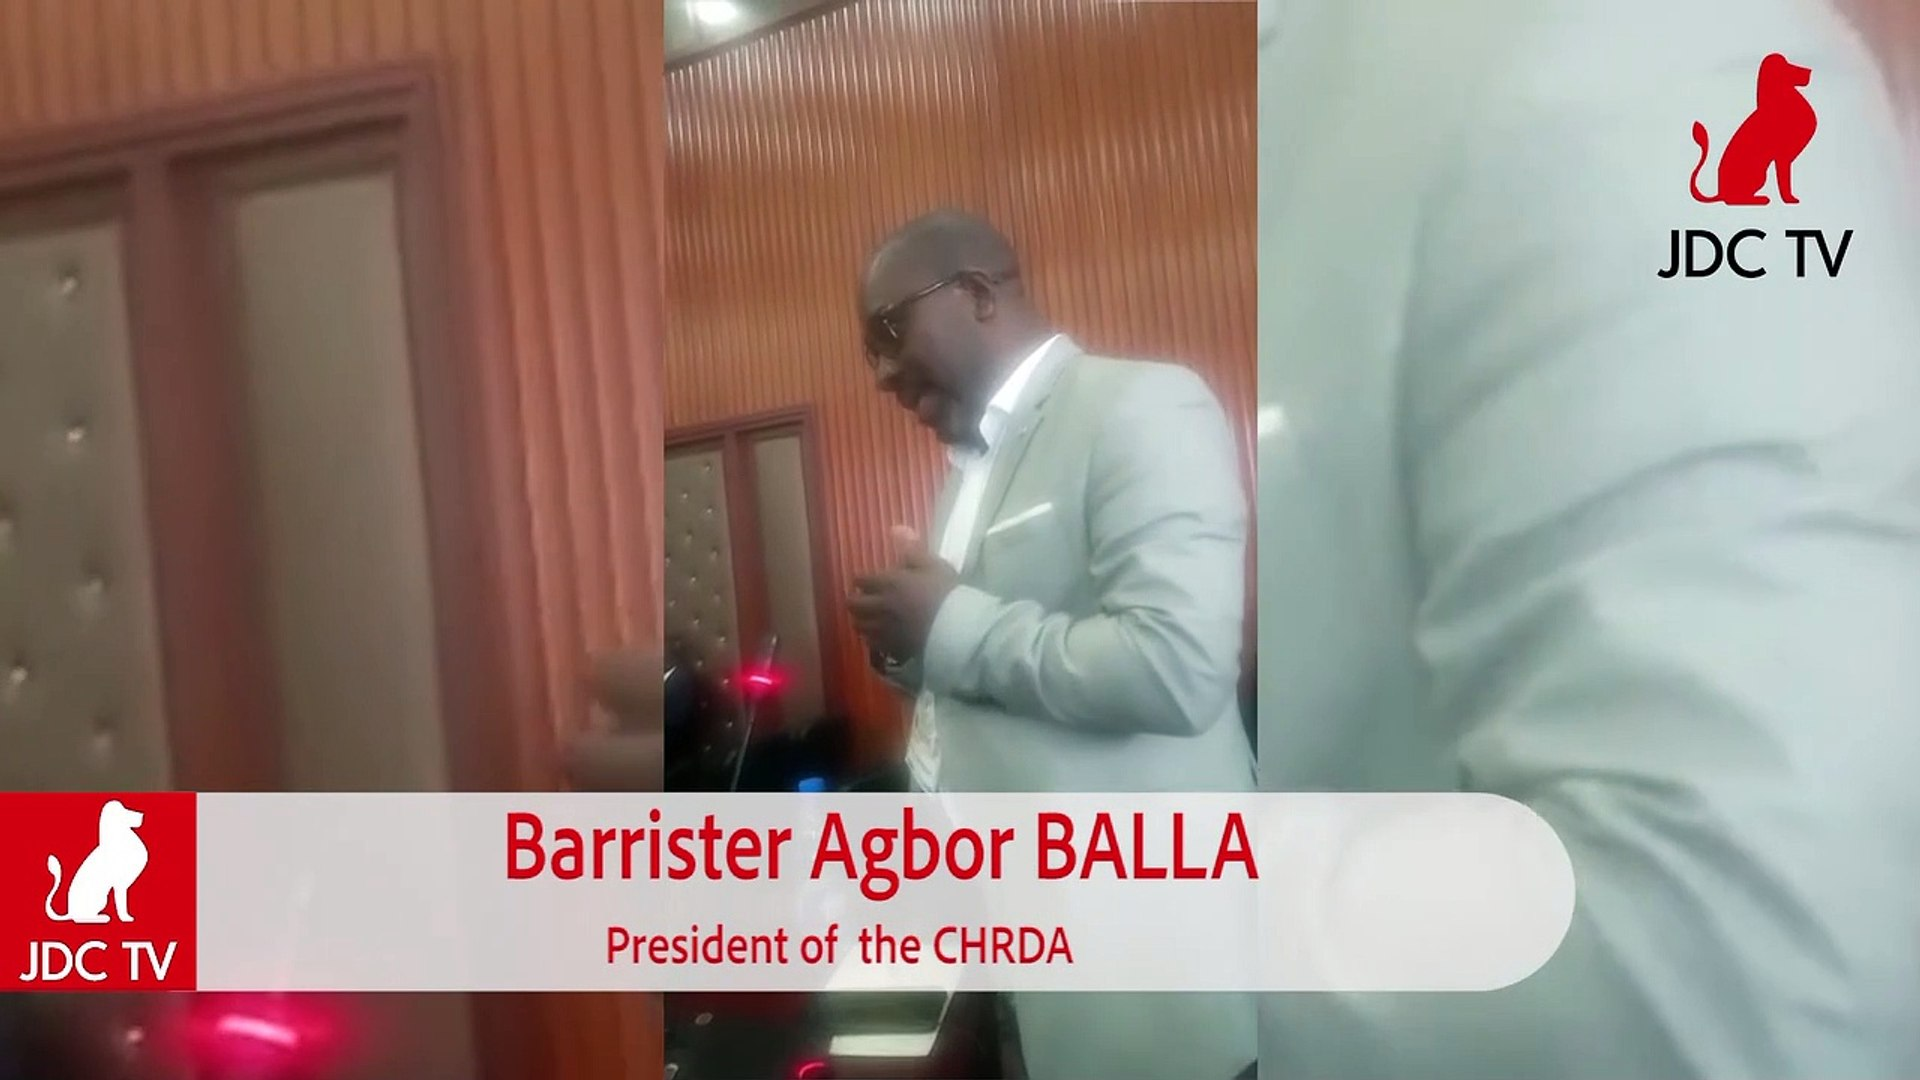 Major National Dialogue: BAR AGBOR BALLA says Federation can solve Anglophone crisis